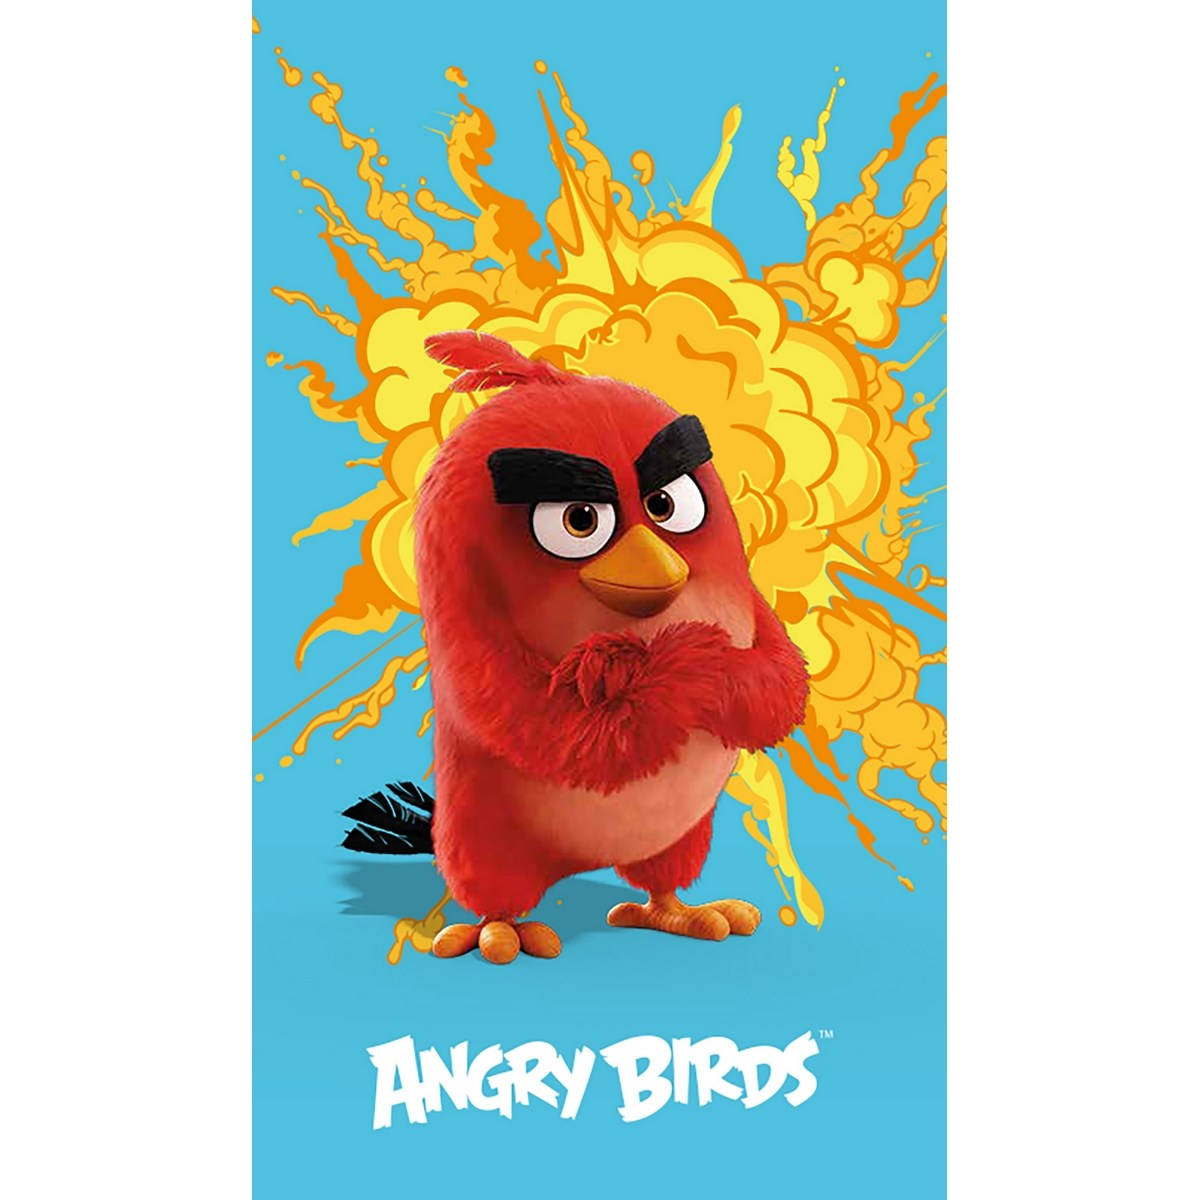 Angry Birds törölköző red 6a72eba56a